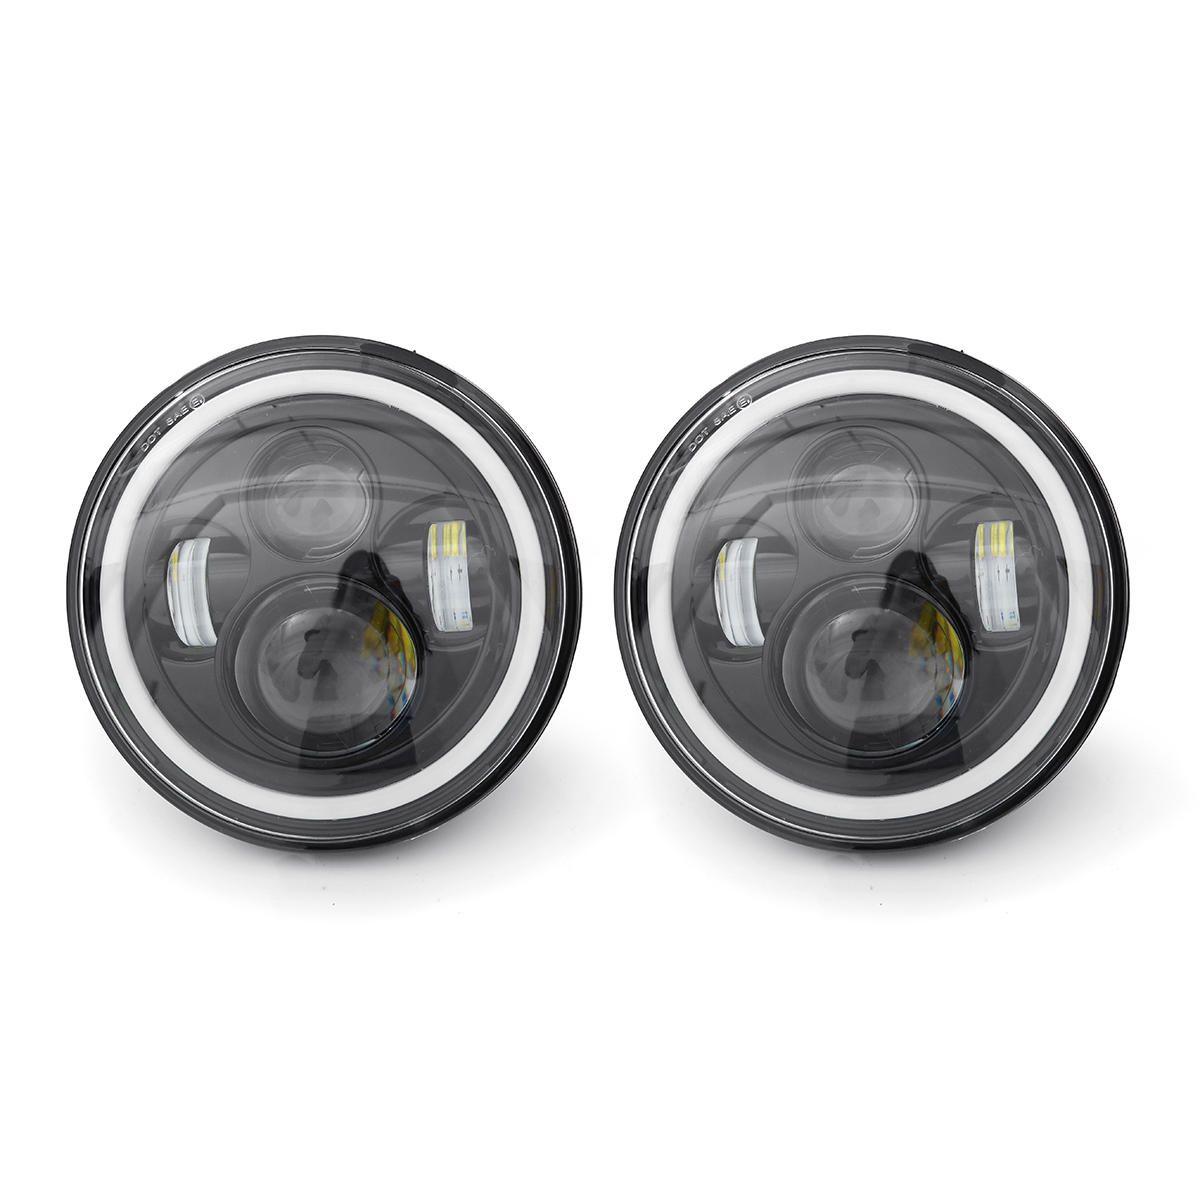 2pcs 7 Inch LED Headlights White/Yellow Light Beam Halo Angle Eye For Jeep Wrangler JK TJ LJ